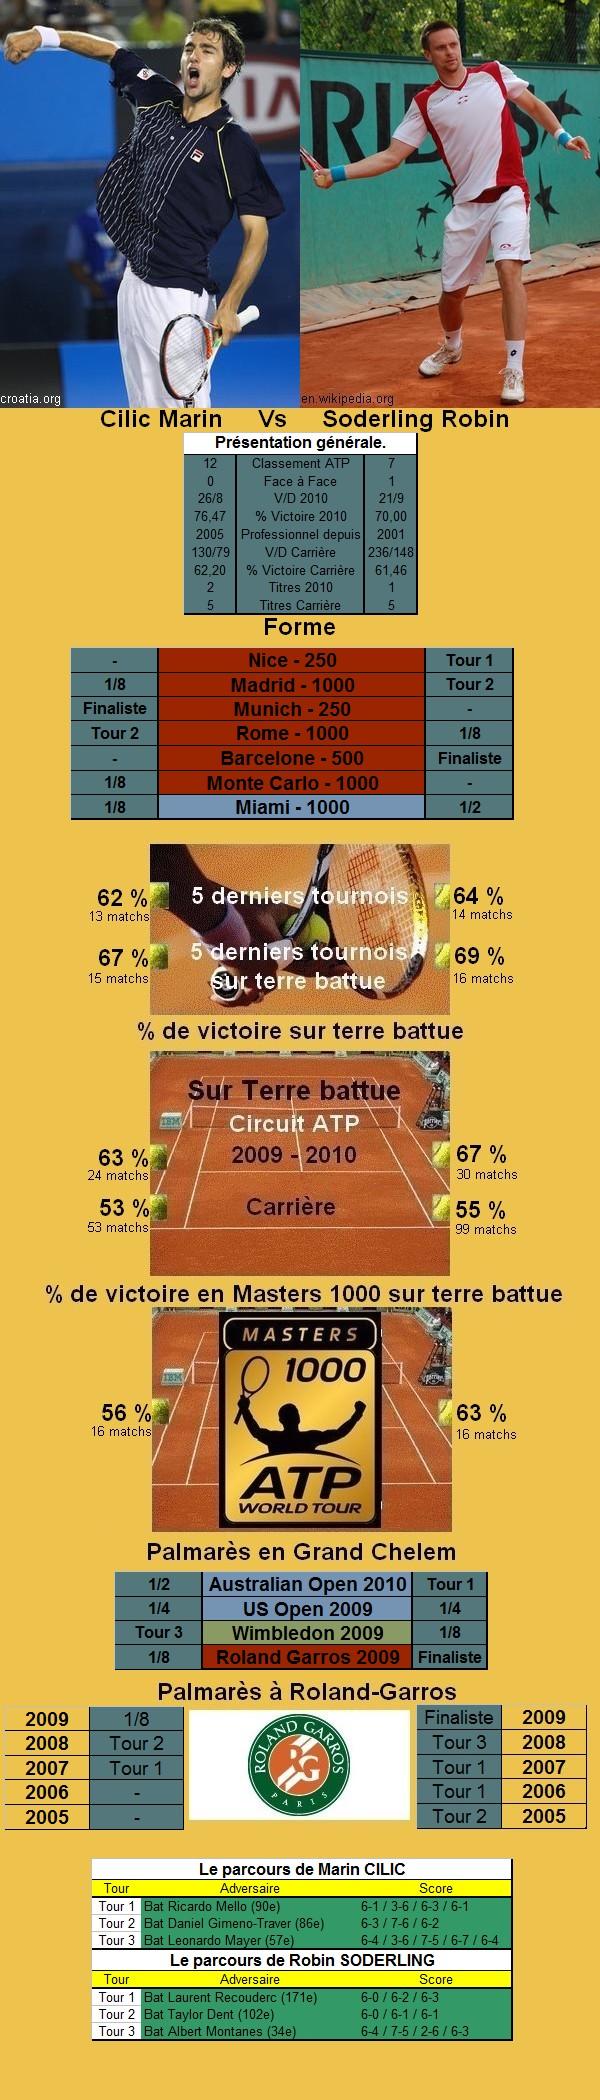 Statistiques tennis de Cilic contre Soderling à Roland Garros